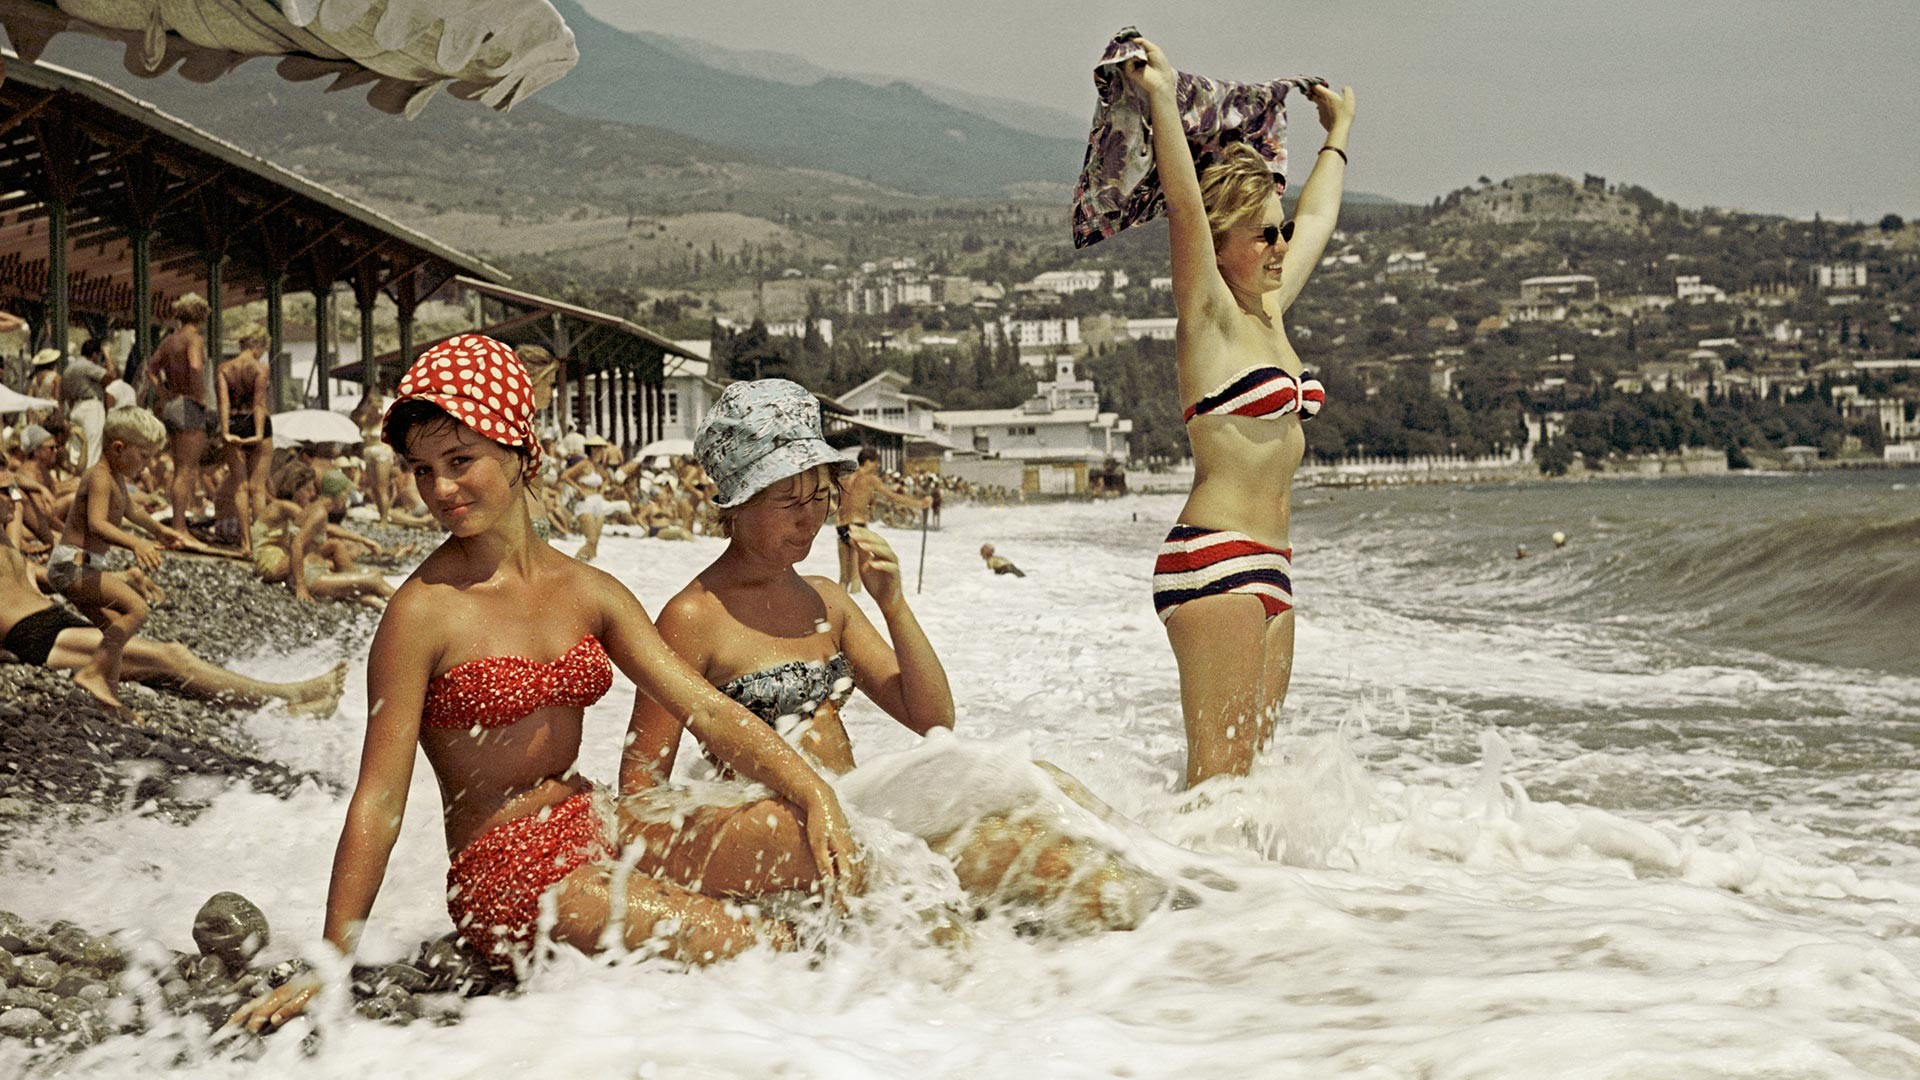 The Black Sea coast of Crimea, vacationing on the beaches Gurzuf